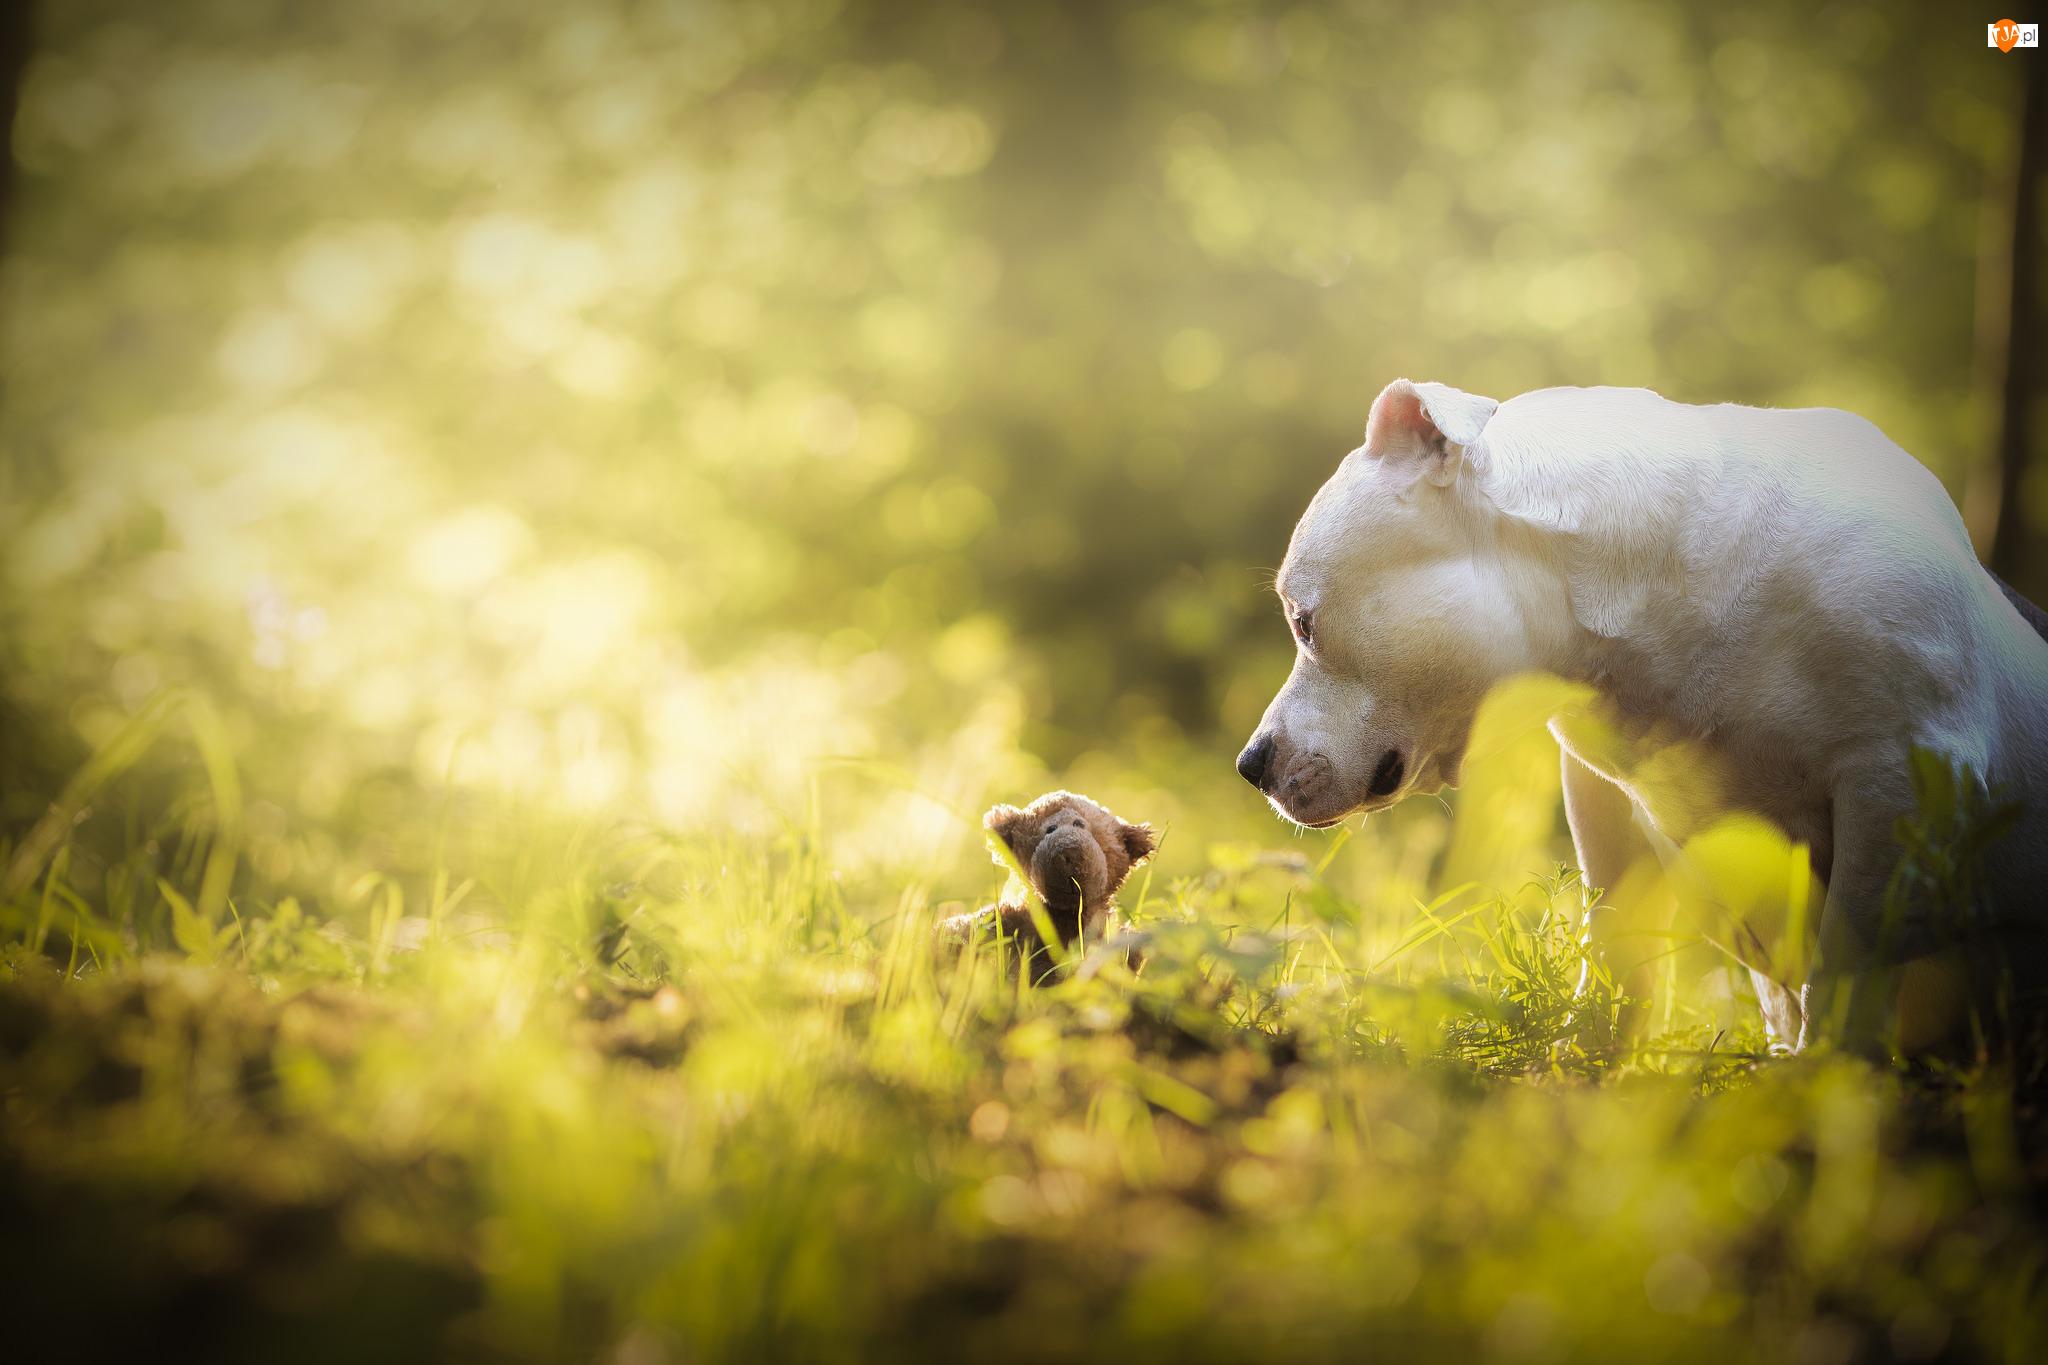 Pit bull terrier, Zabawka, Pies, Łąka, Biały, Maskotka